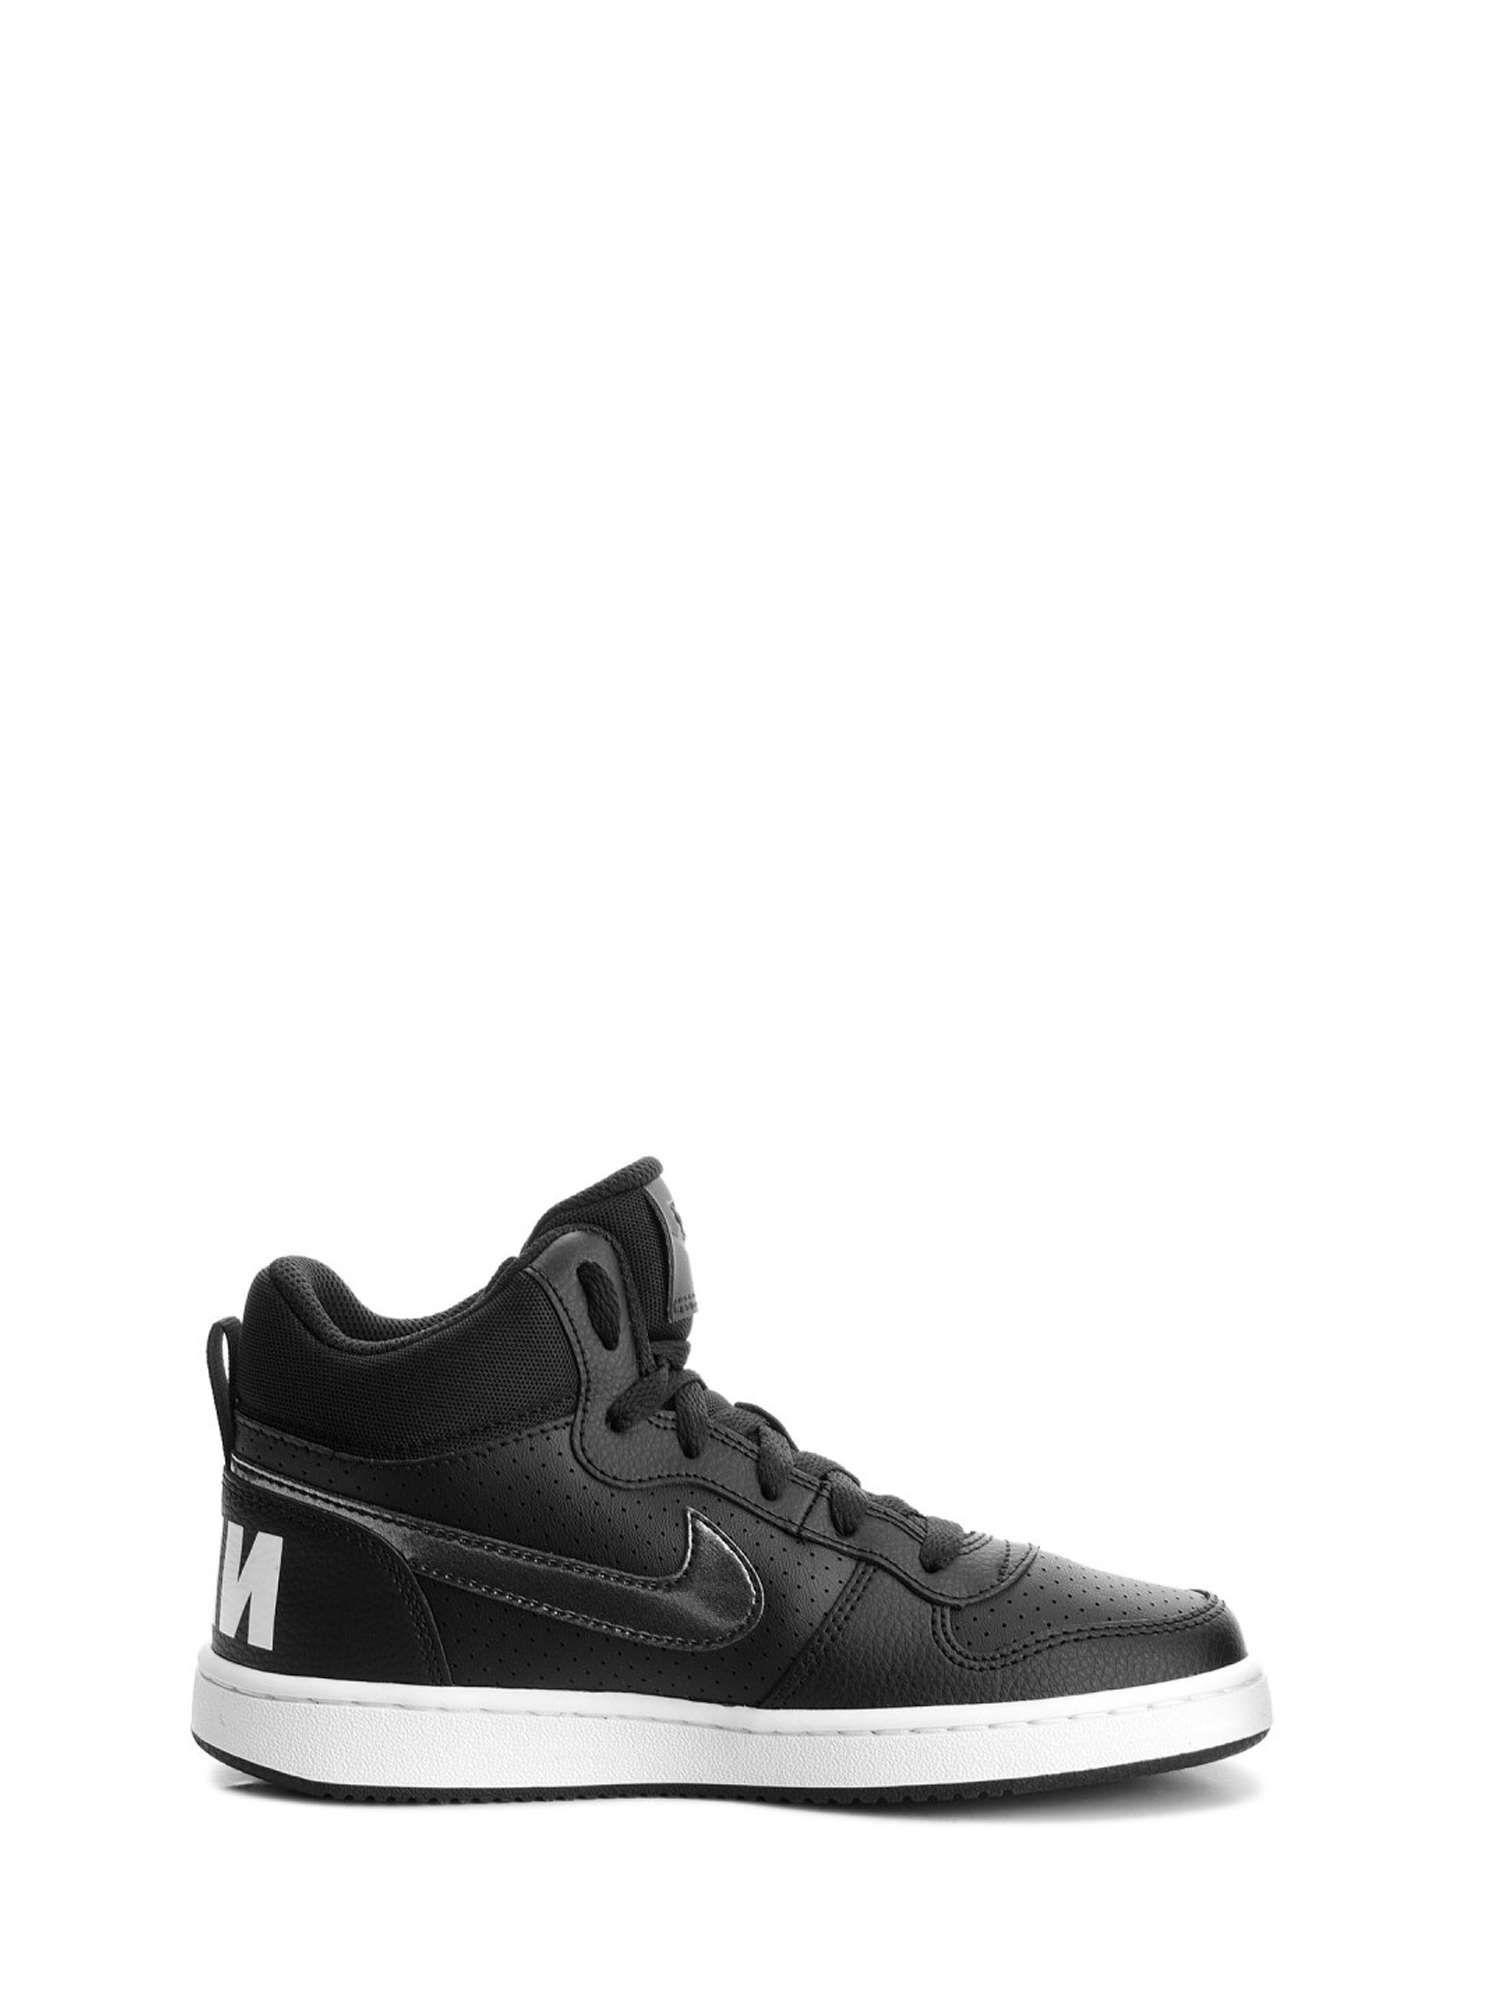 buy online 97512 ac8c2 Nike 845107 Nero   Scarpa ginnica   Scarpe   Fantasia Calzature   Scarpe  online   Abbigliamento